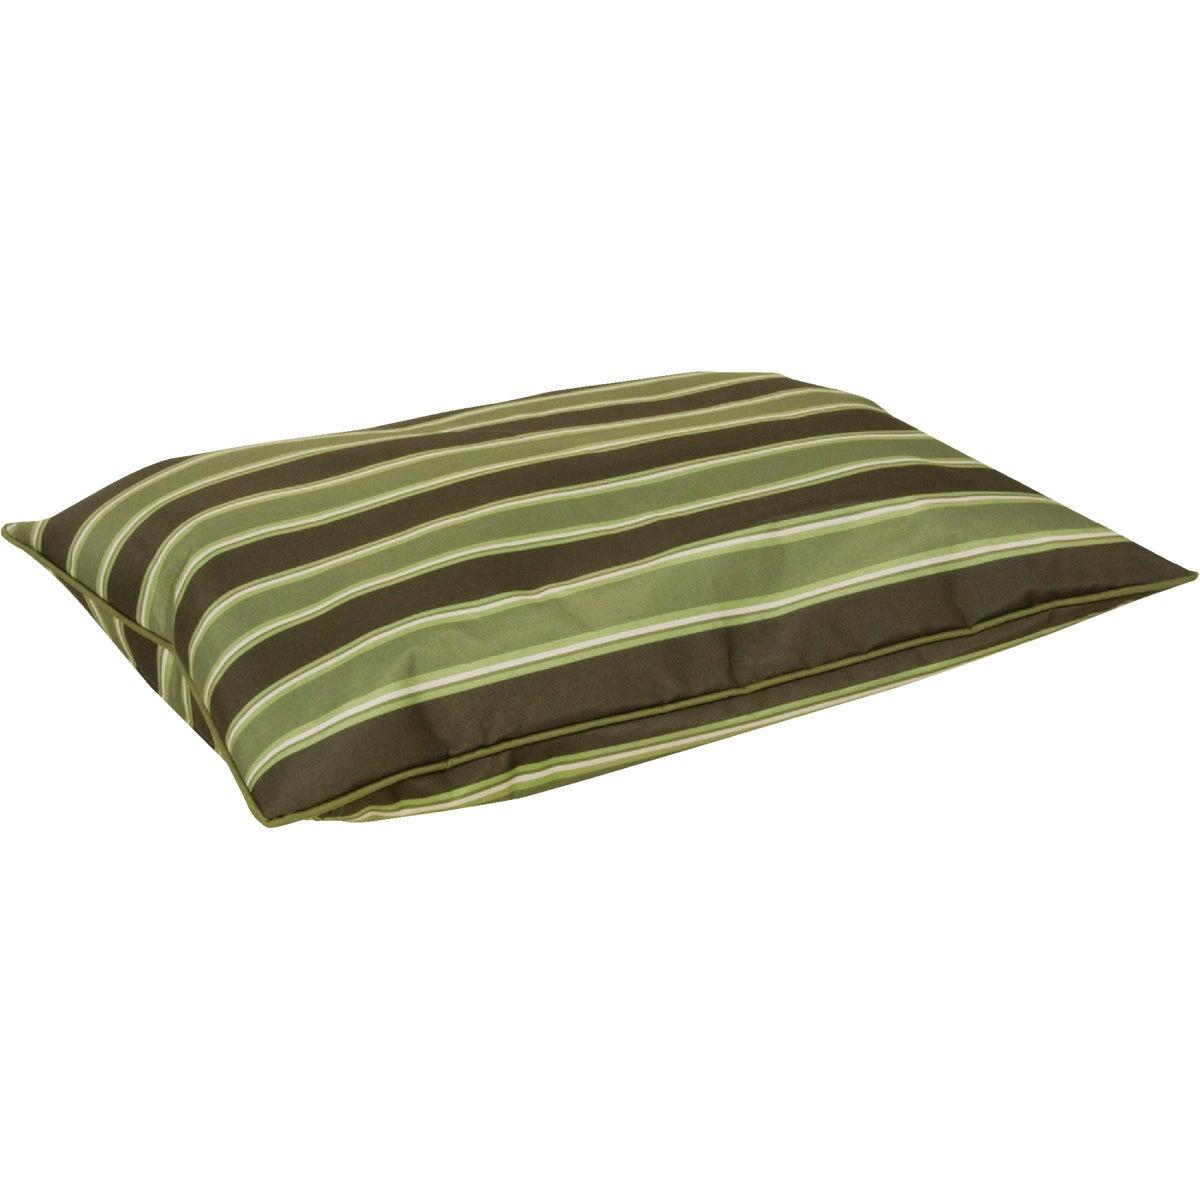 27X36 CHEW RESISTANT BED